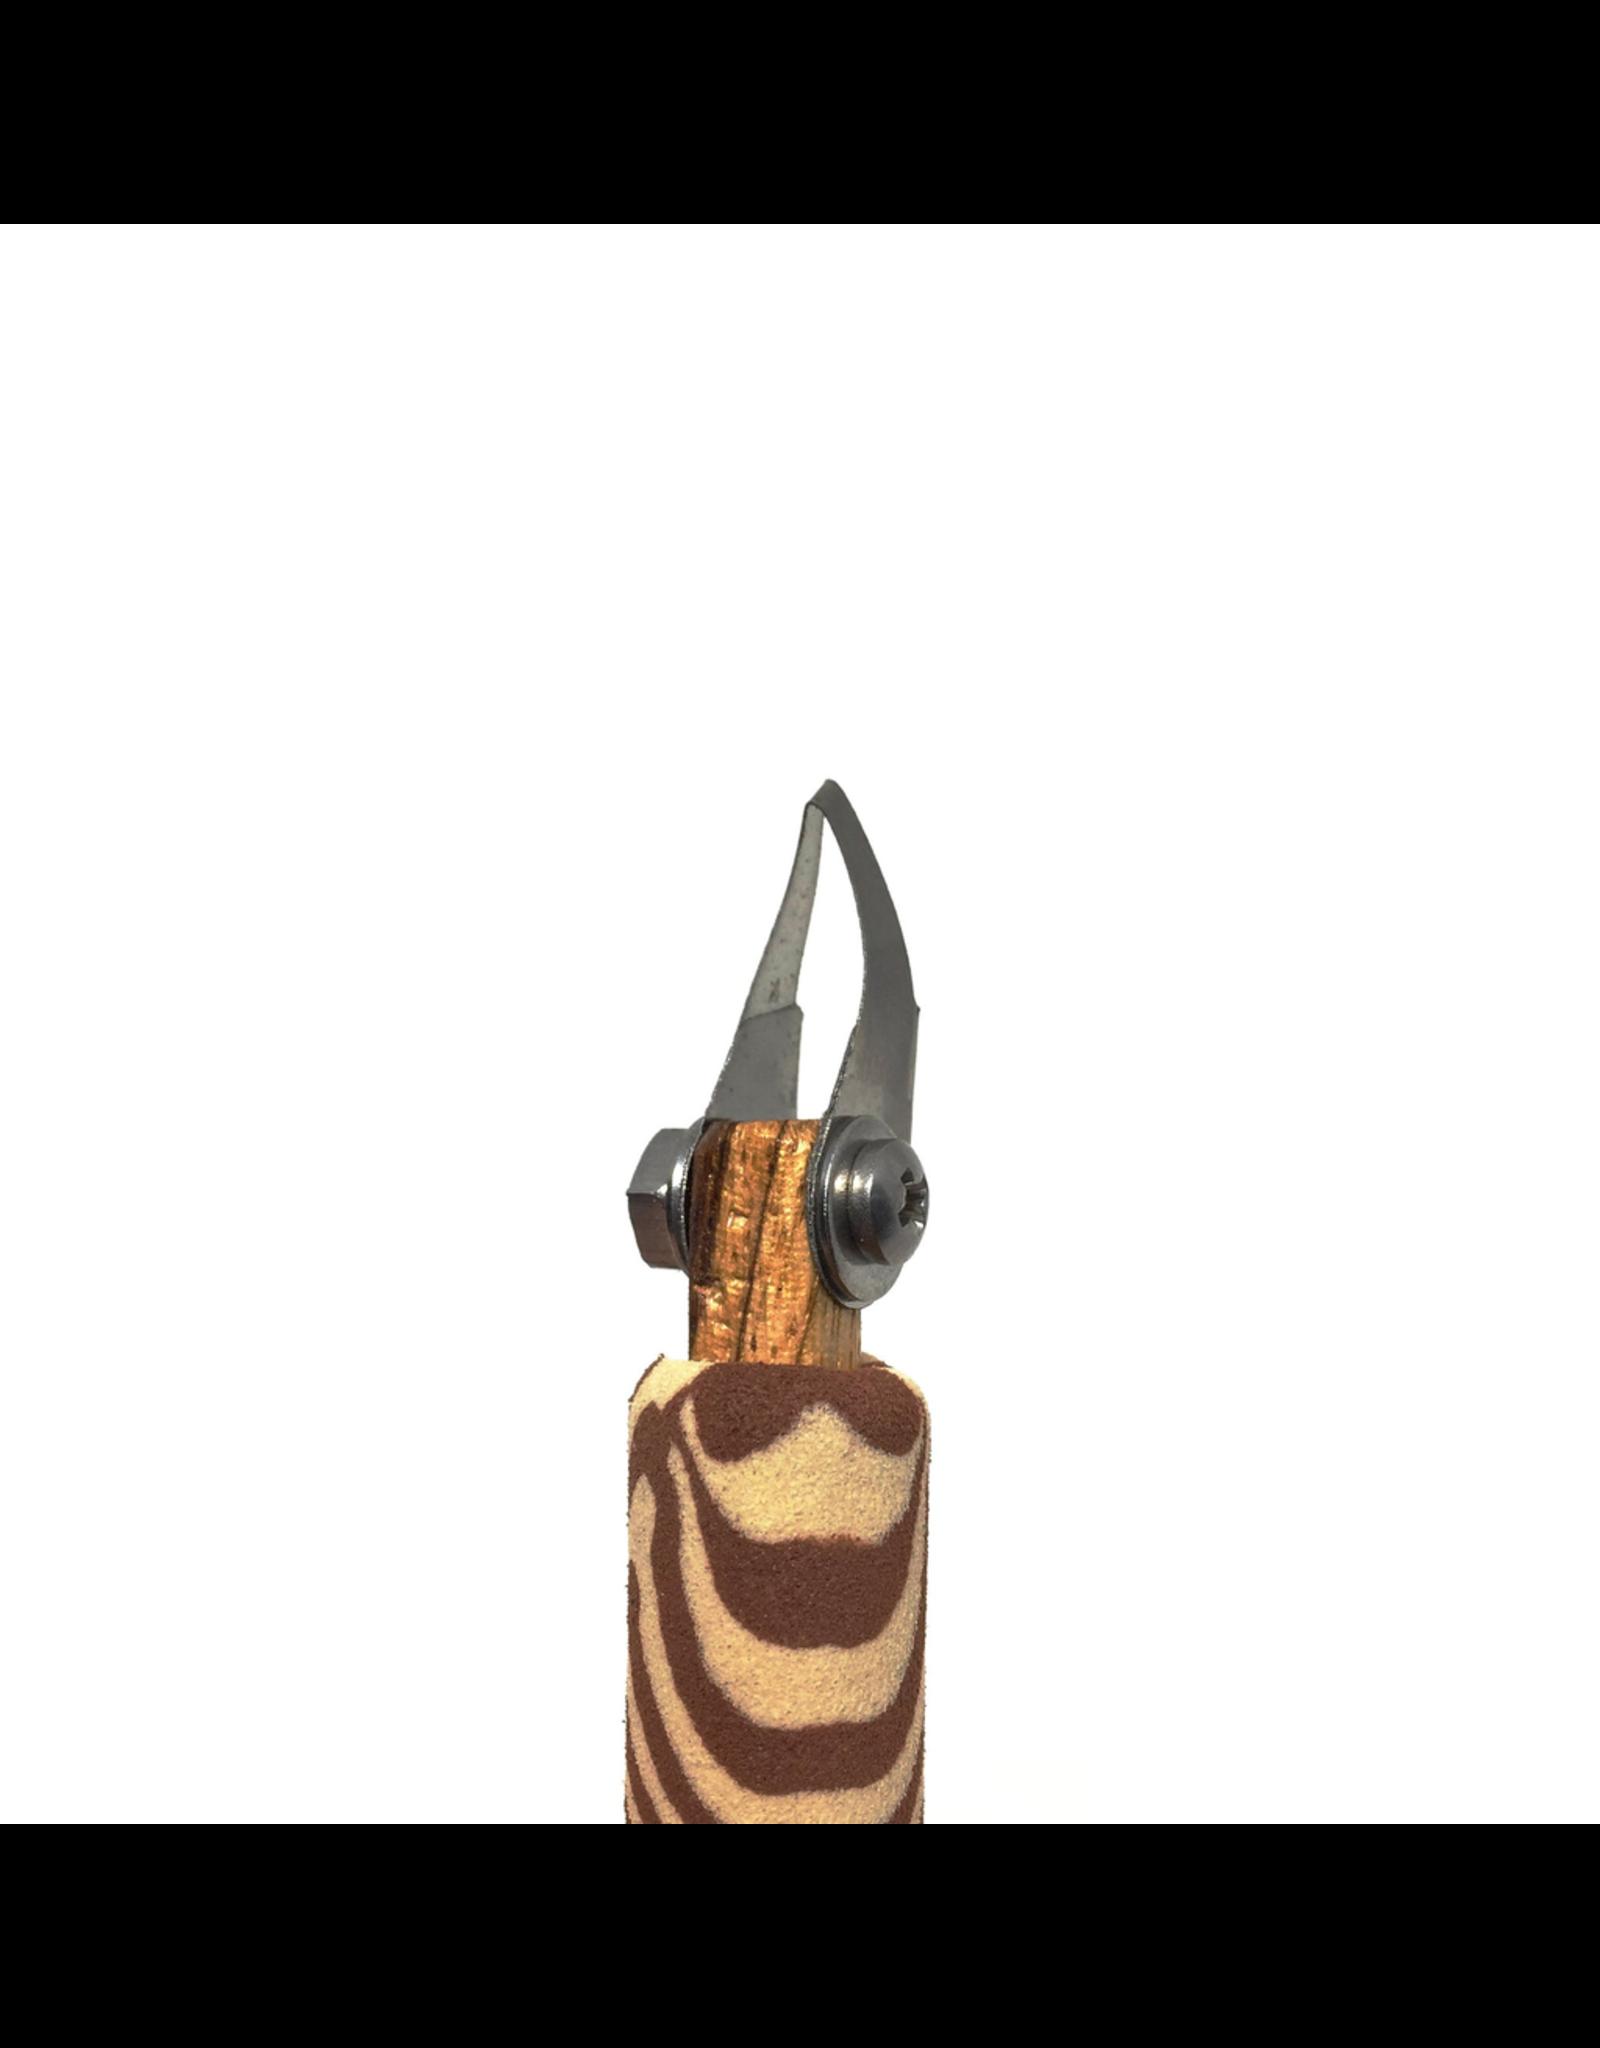 Diamondcore Tools Curved V-Tip Palm Carver (P8)